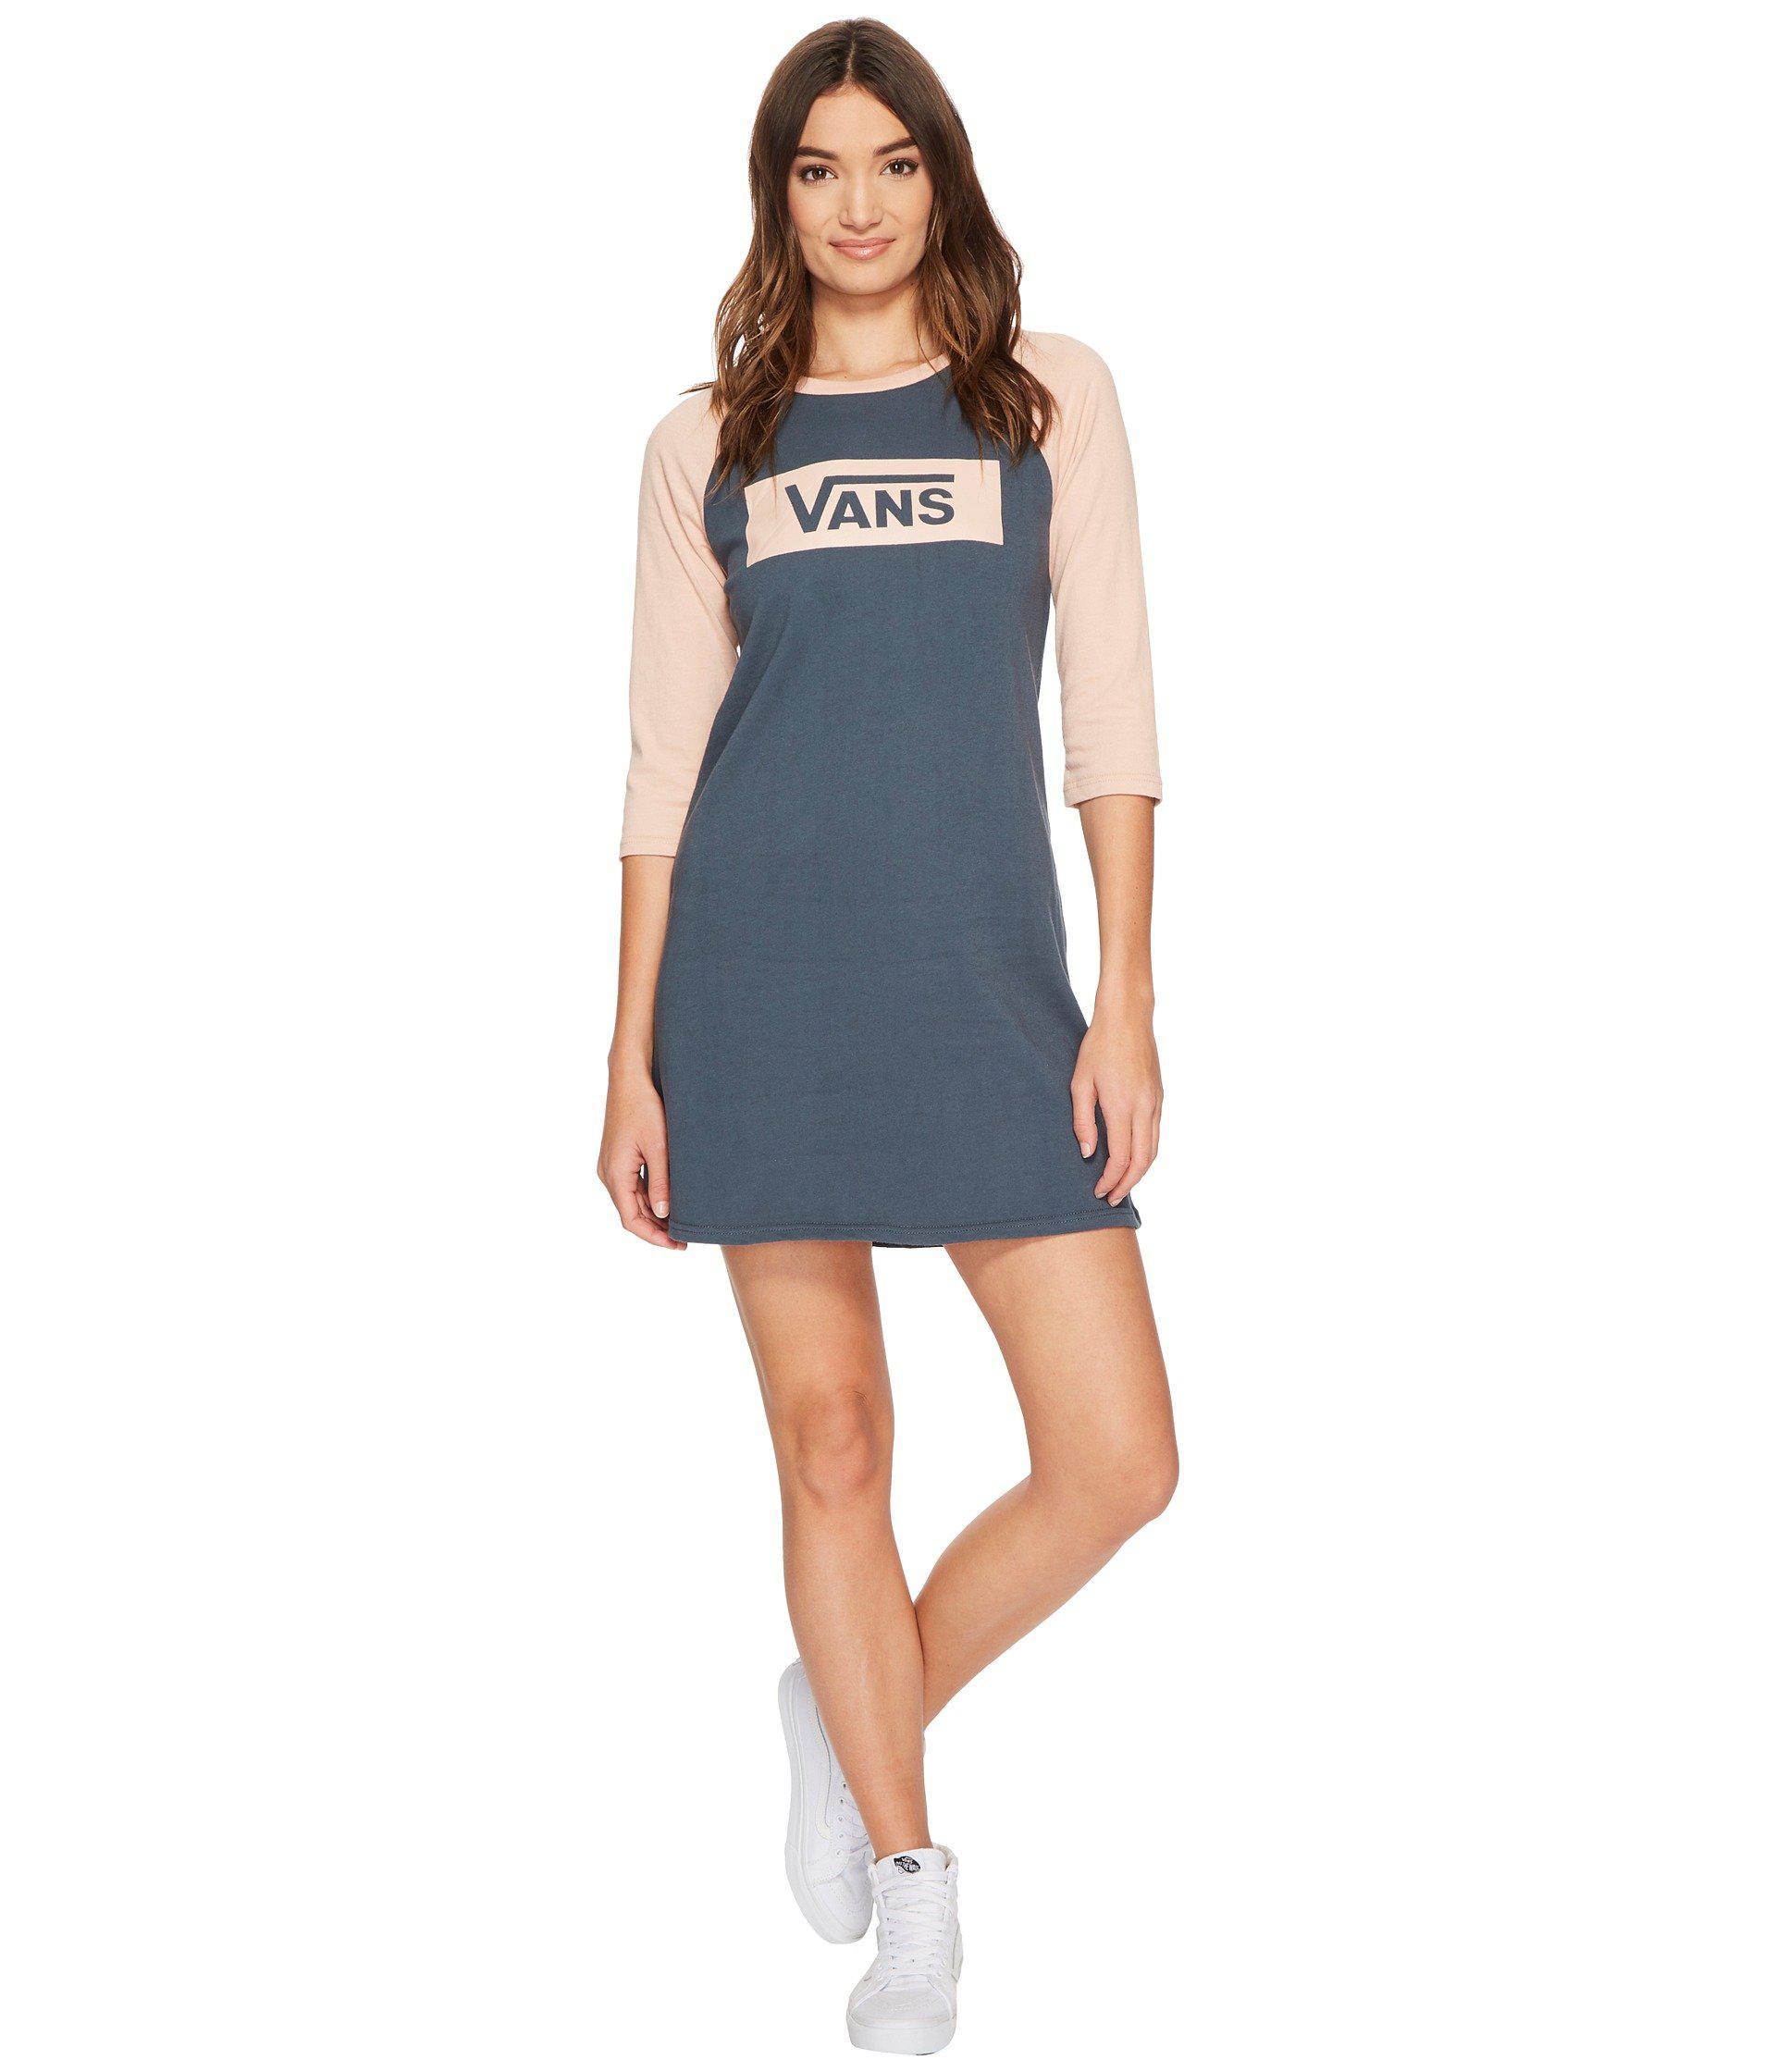 6c09f93f7d2 Vans Open Road Raglan Dress in Blue - Lyst